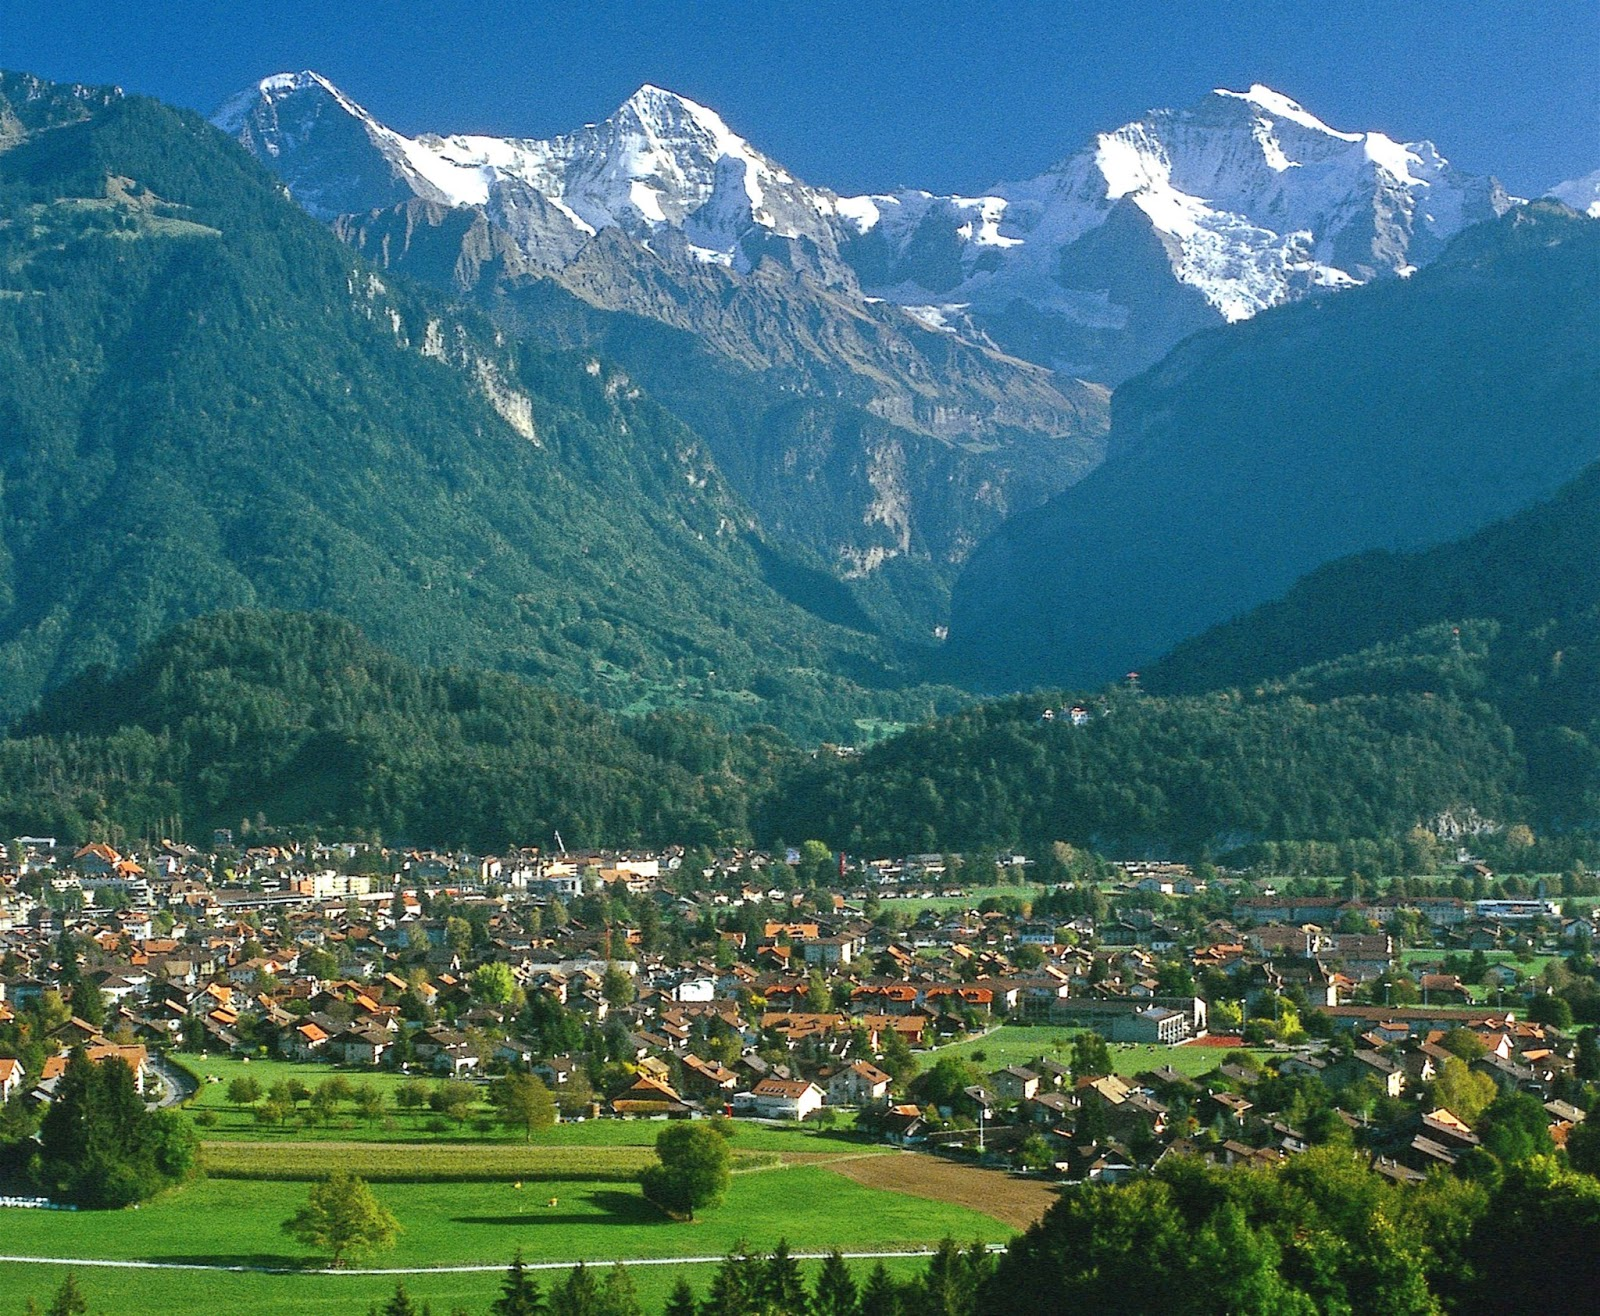 ___ Switzerland